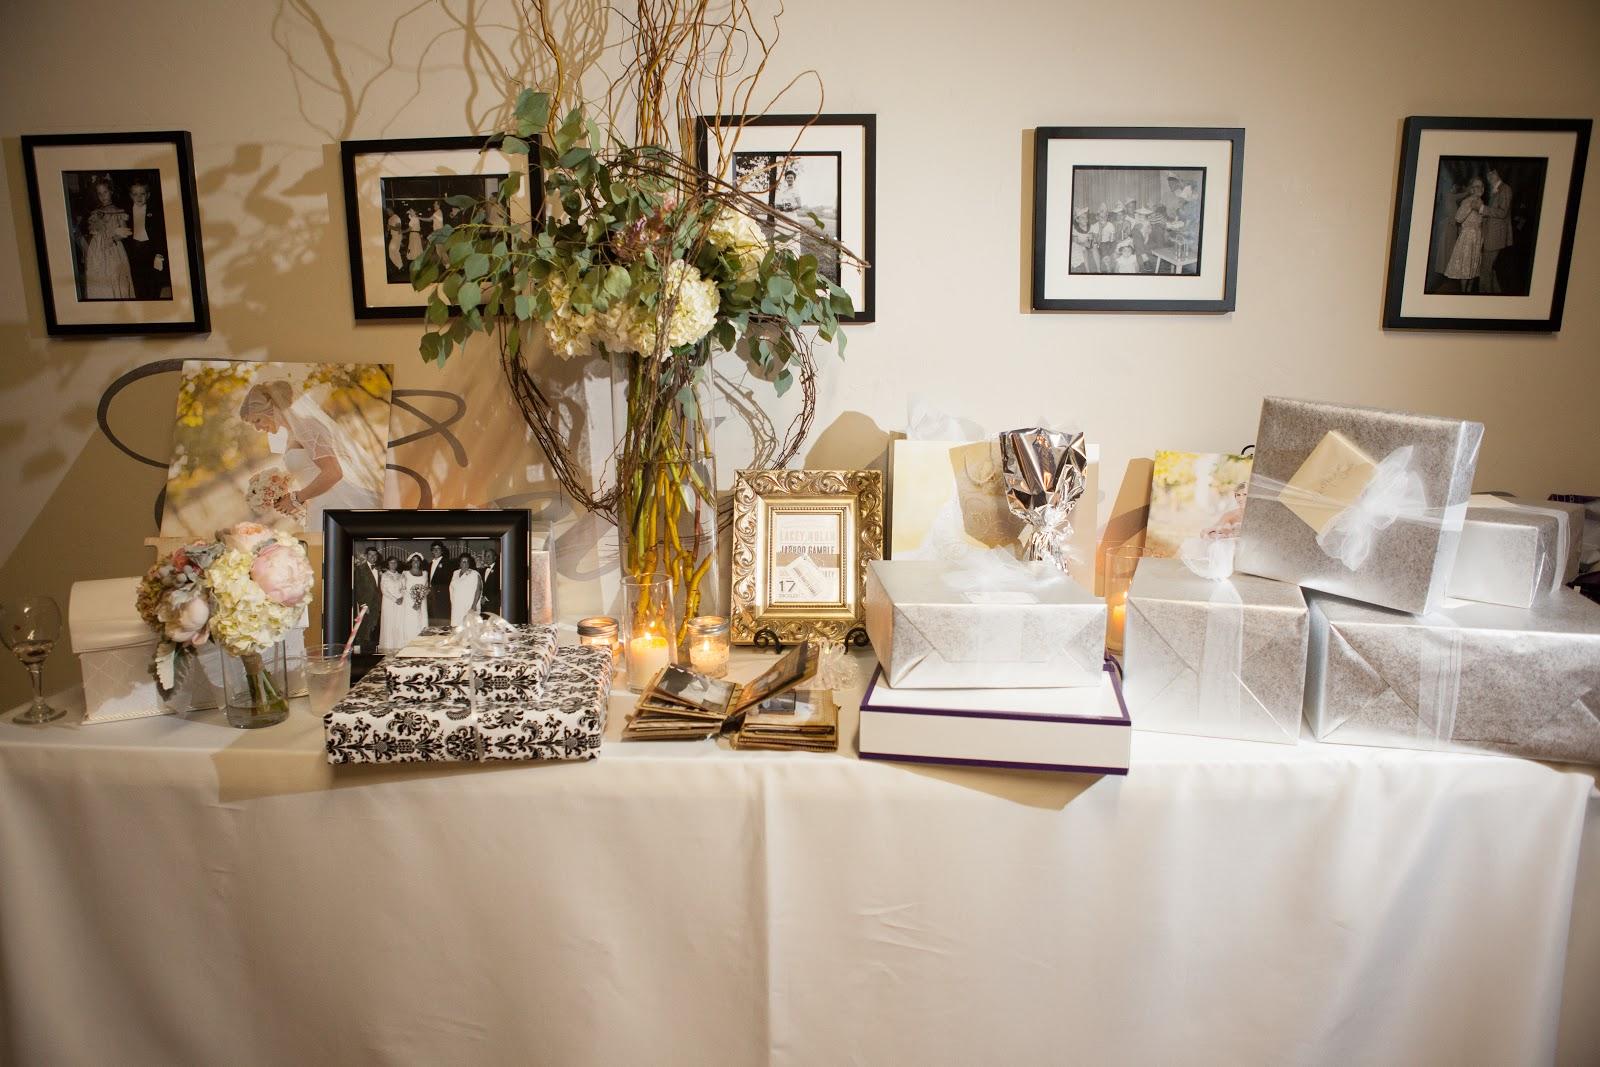 Ideas For Wedding Gifts On Tables : Ideas. Wedding Gift Table Ideas. Skinnycargopantsaddict Wedding ...